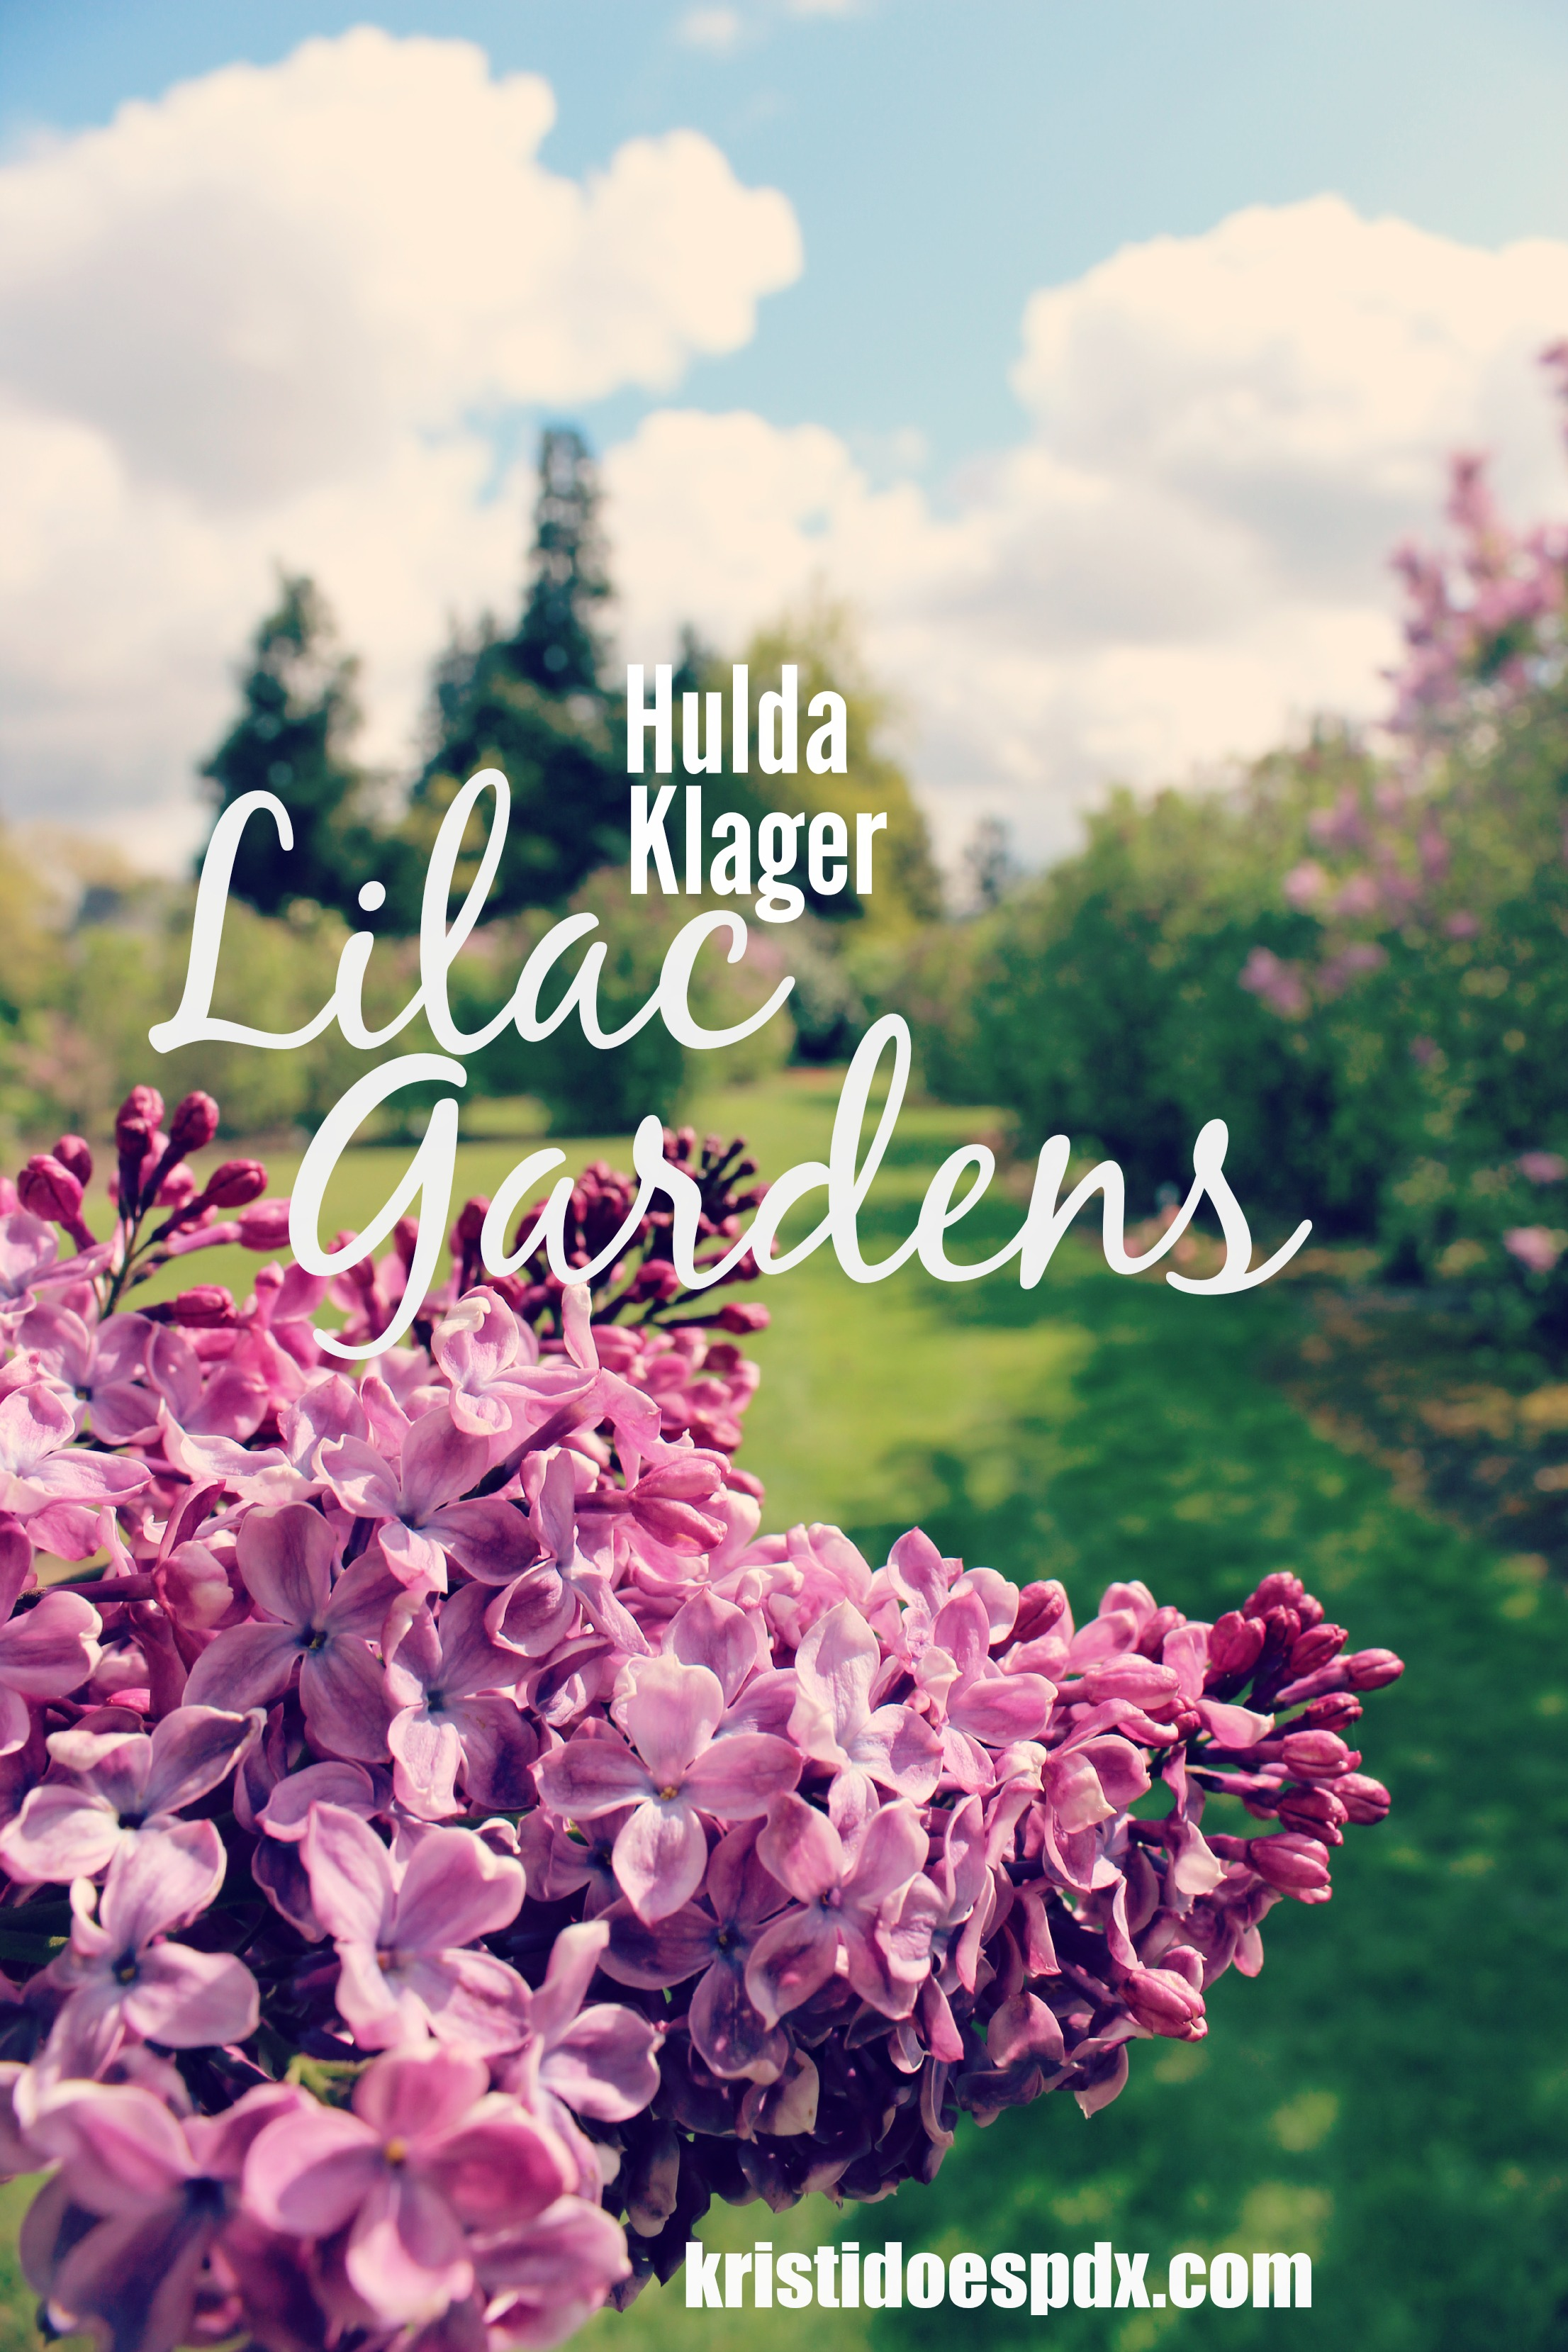 Hulda Klager Lilac Gardens Kristi Does Pdx Adventures